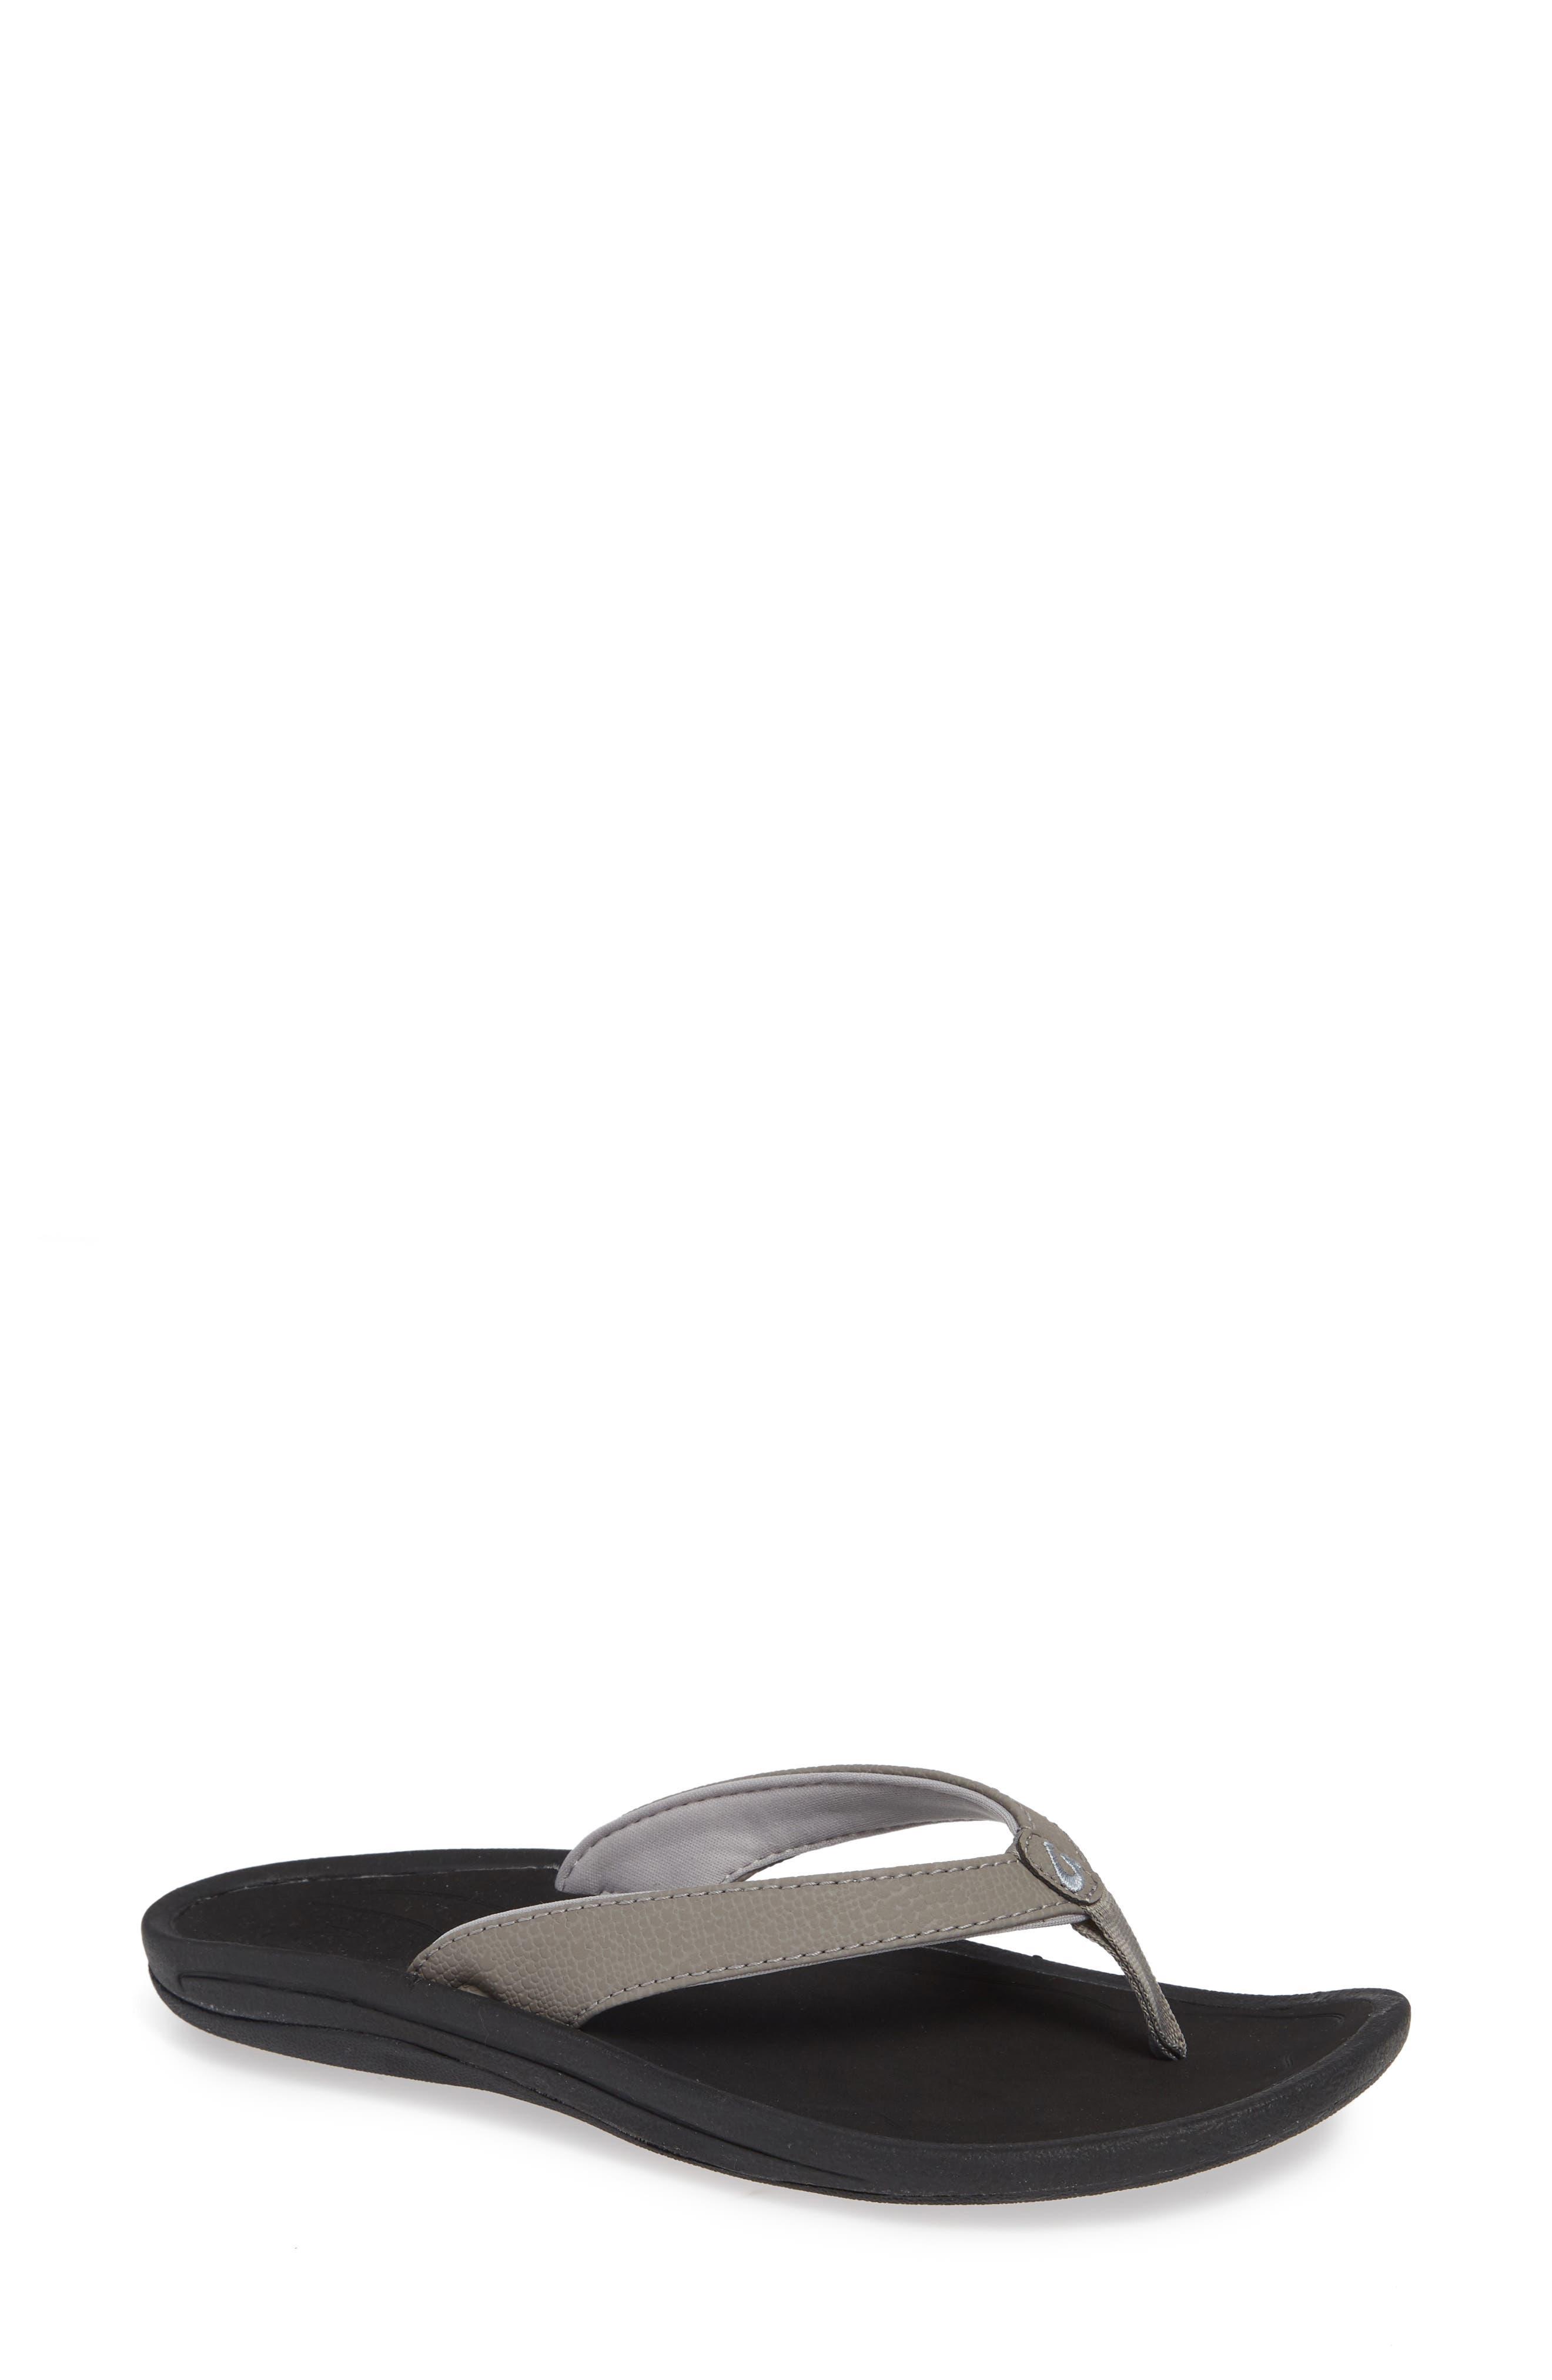 'Kulapa Kai' Thong Sandal, Main, color, FOG/ BLACK FABRIC